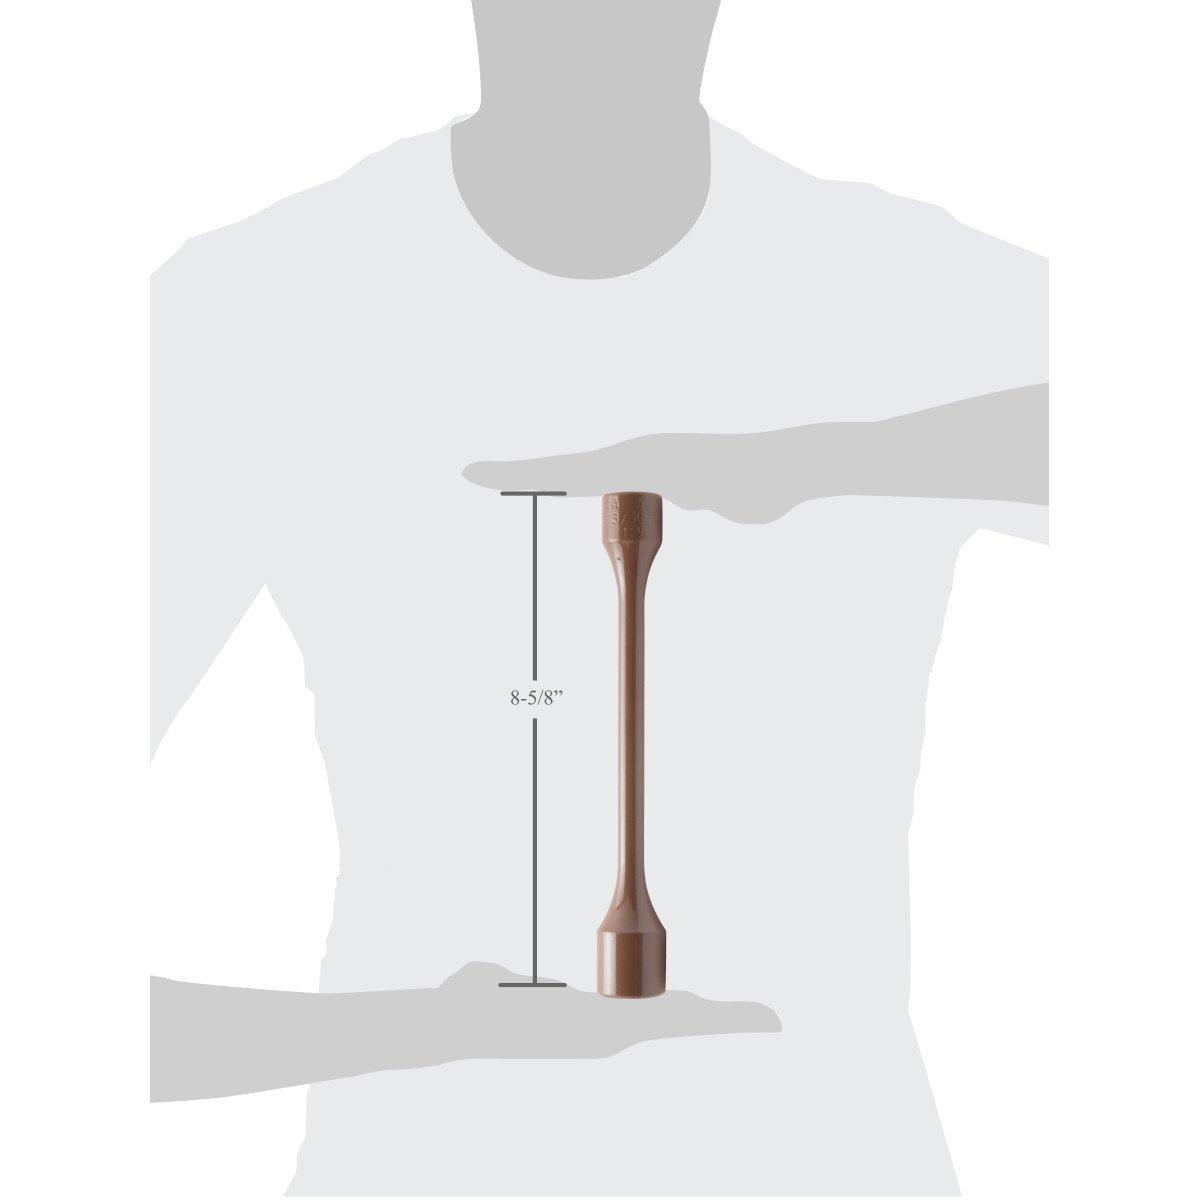 Brown Steelman 50062 1//2-Inch Drive x 13//16-Inch 100 ft-lb Torque Stick